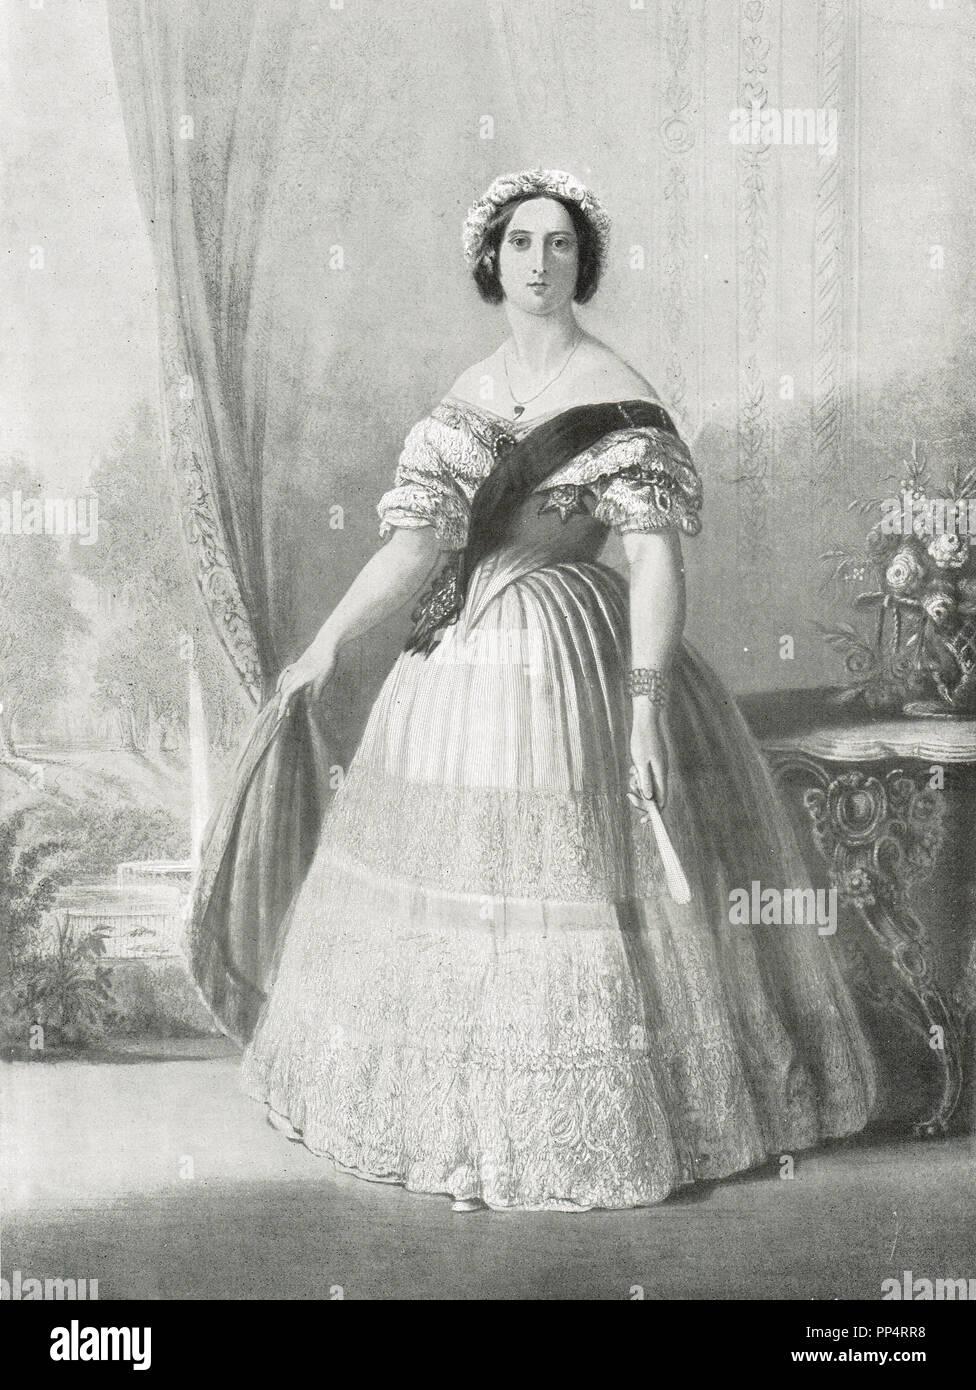 La reine Victoria en 1843 Photo Stock